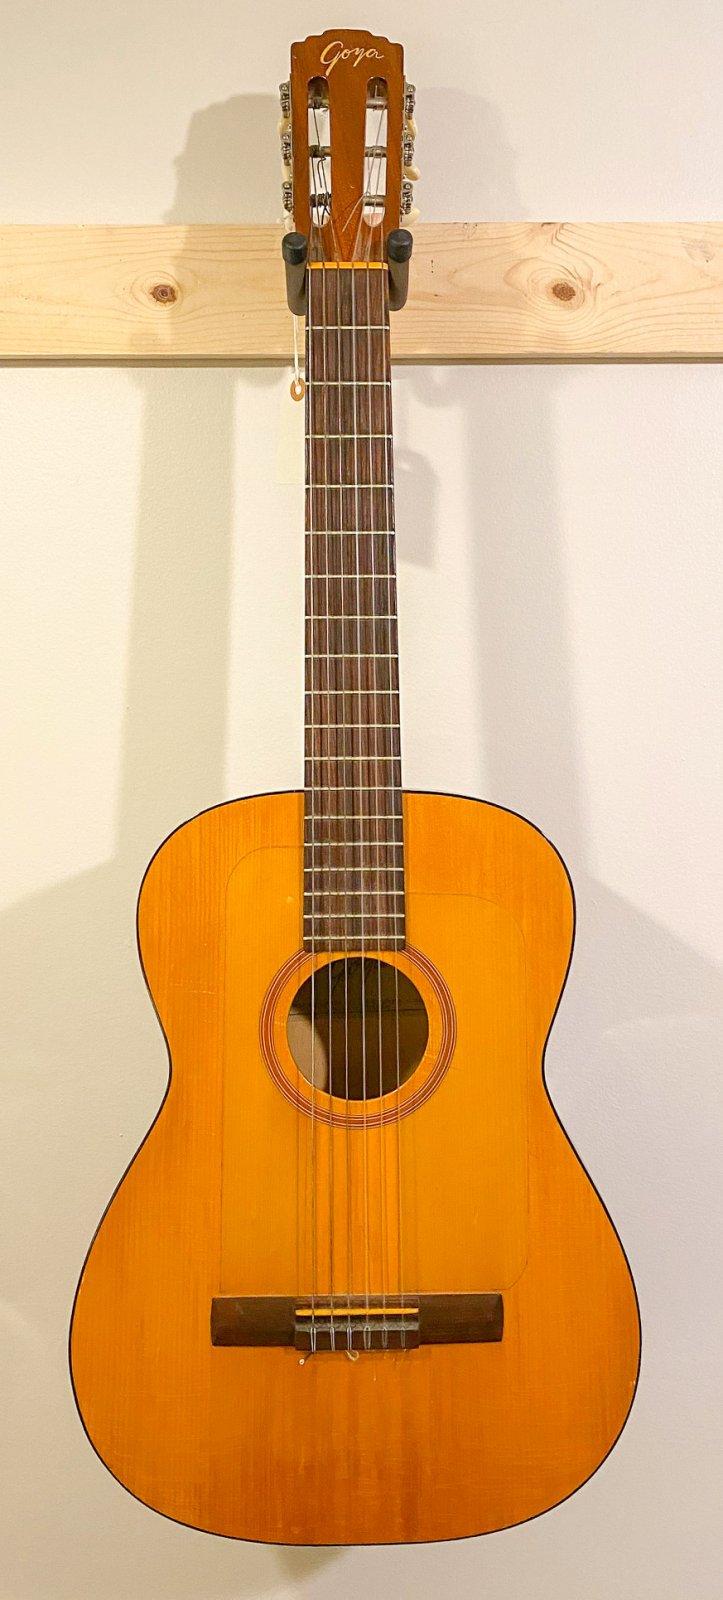 1966 Goya G-10 classical guitar